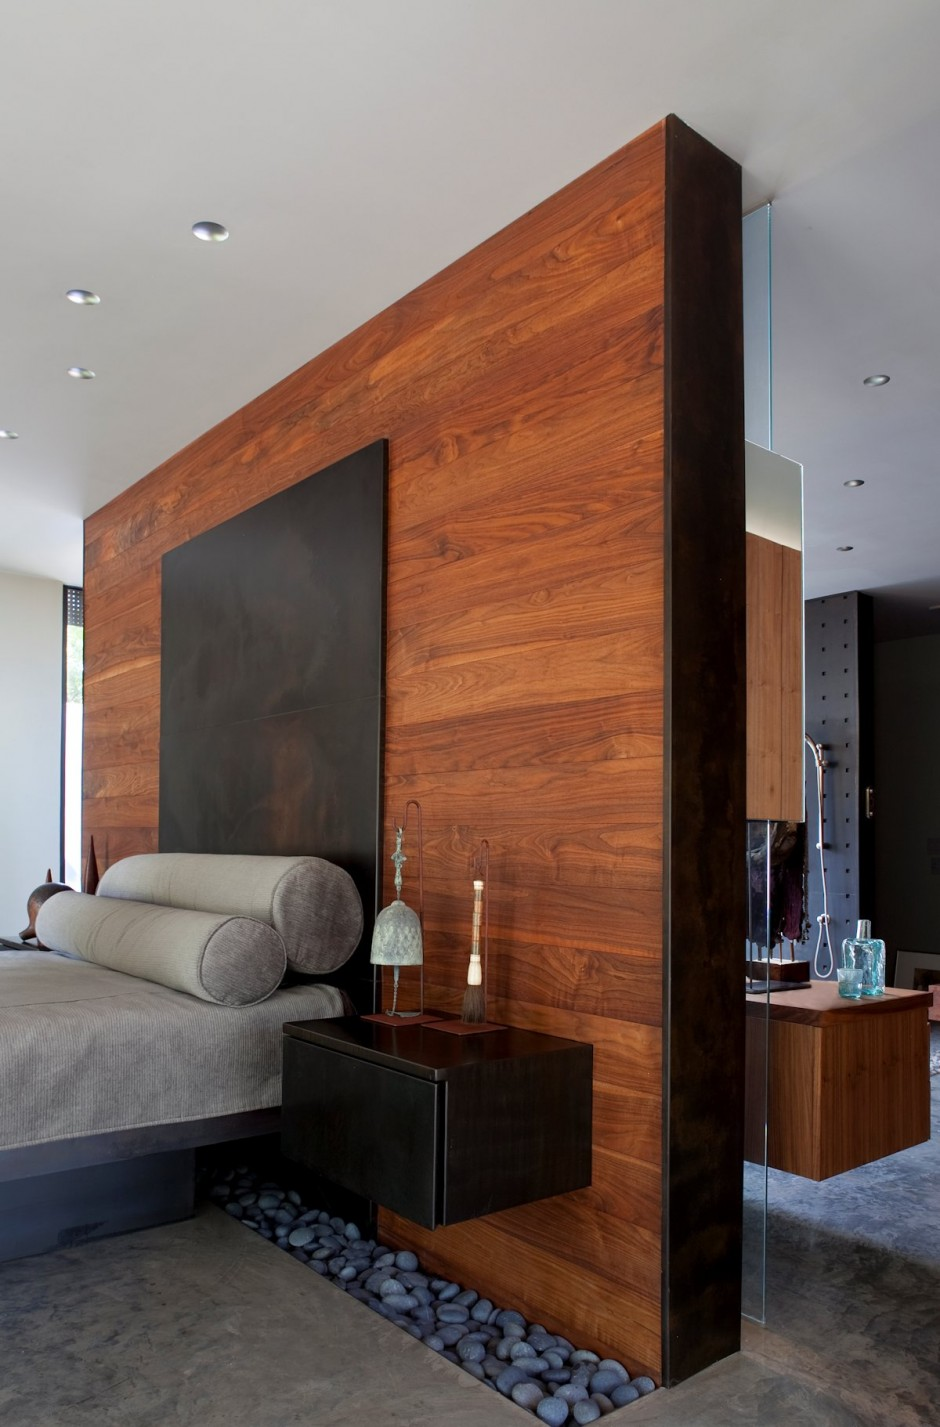 50 Master Bedroom Ideas That Go Beyond The Basics on Best Master Bedroom Designs  id=69673